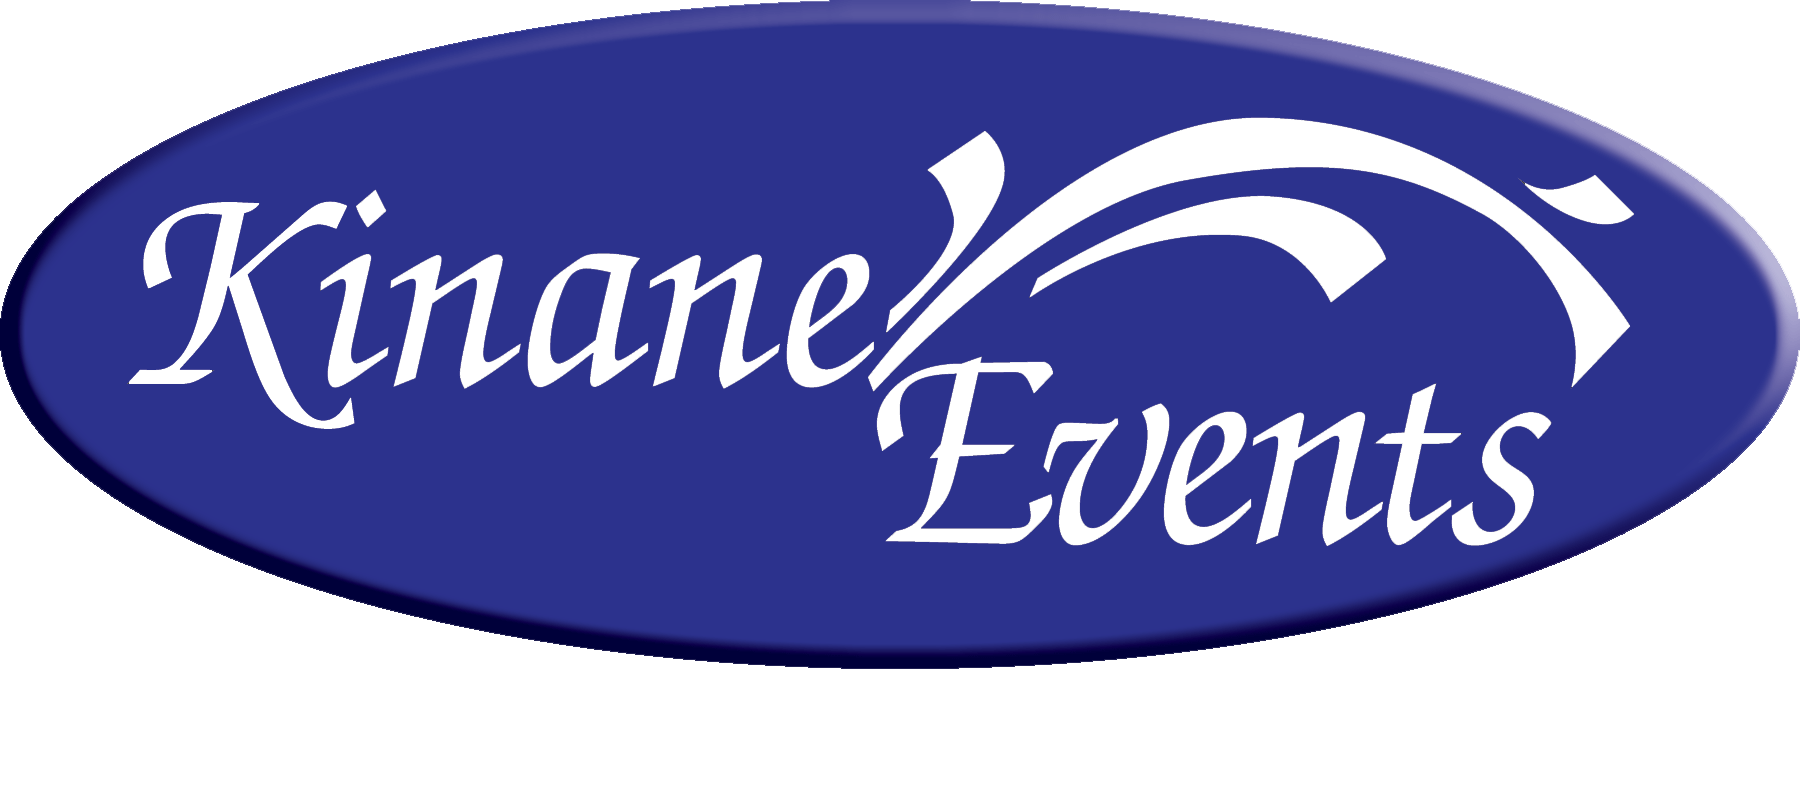 Kinane Events